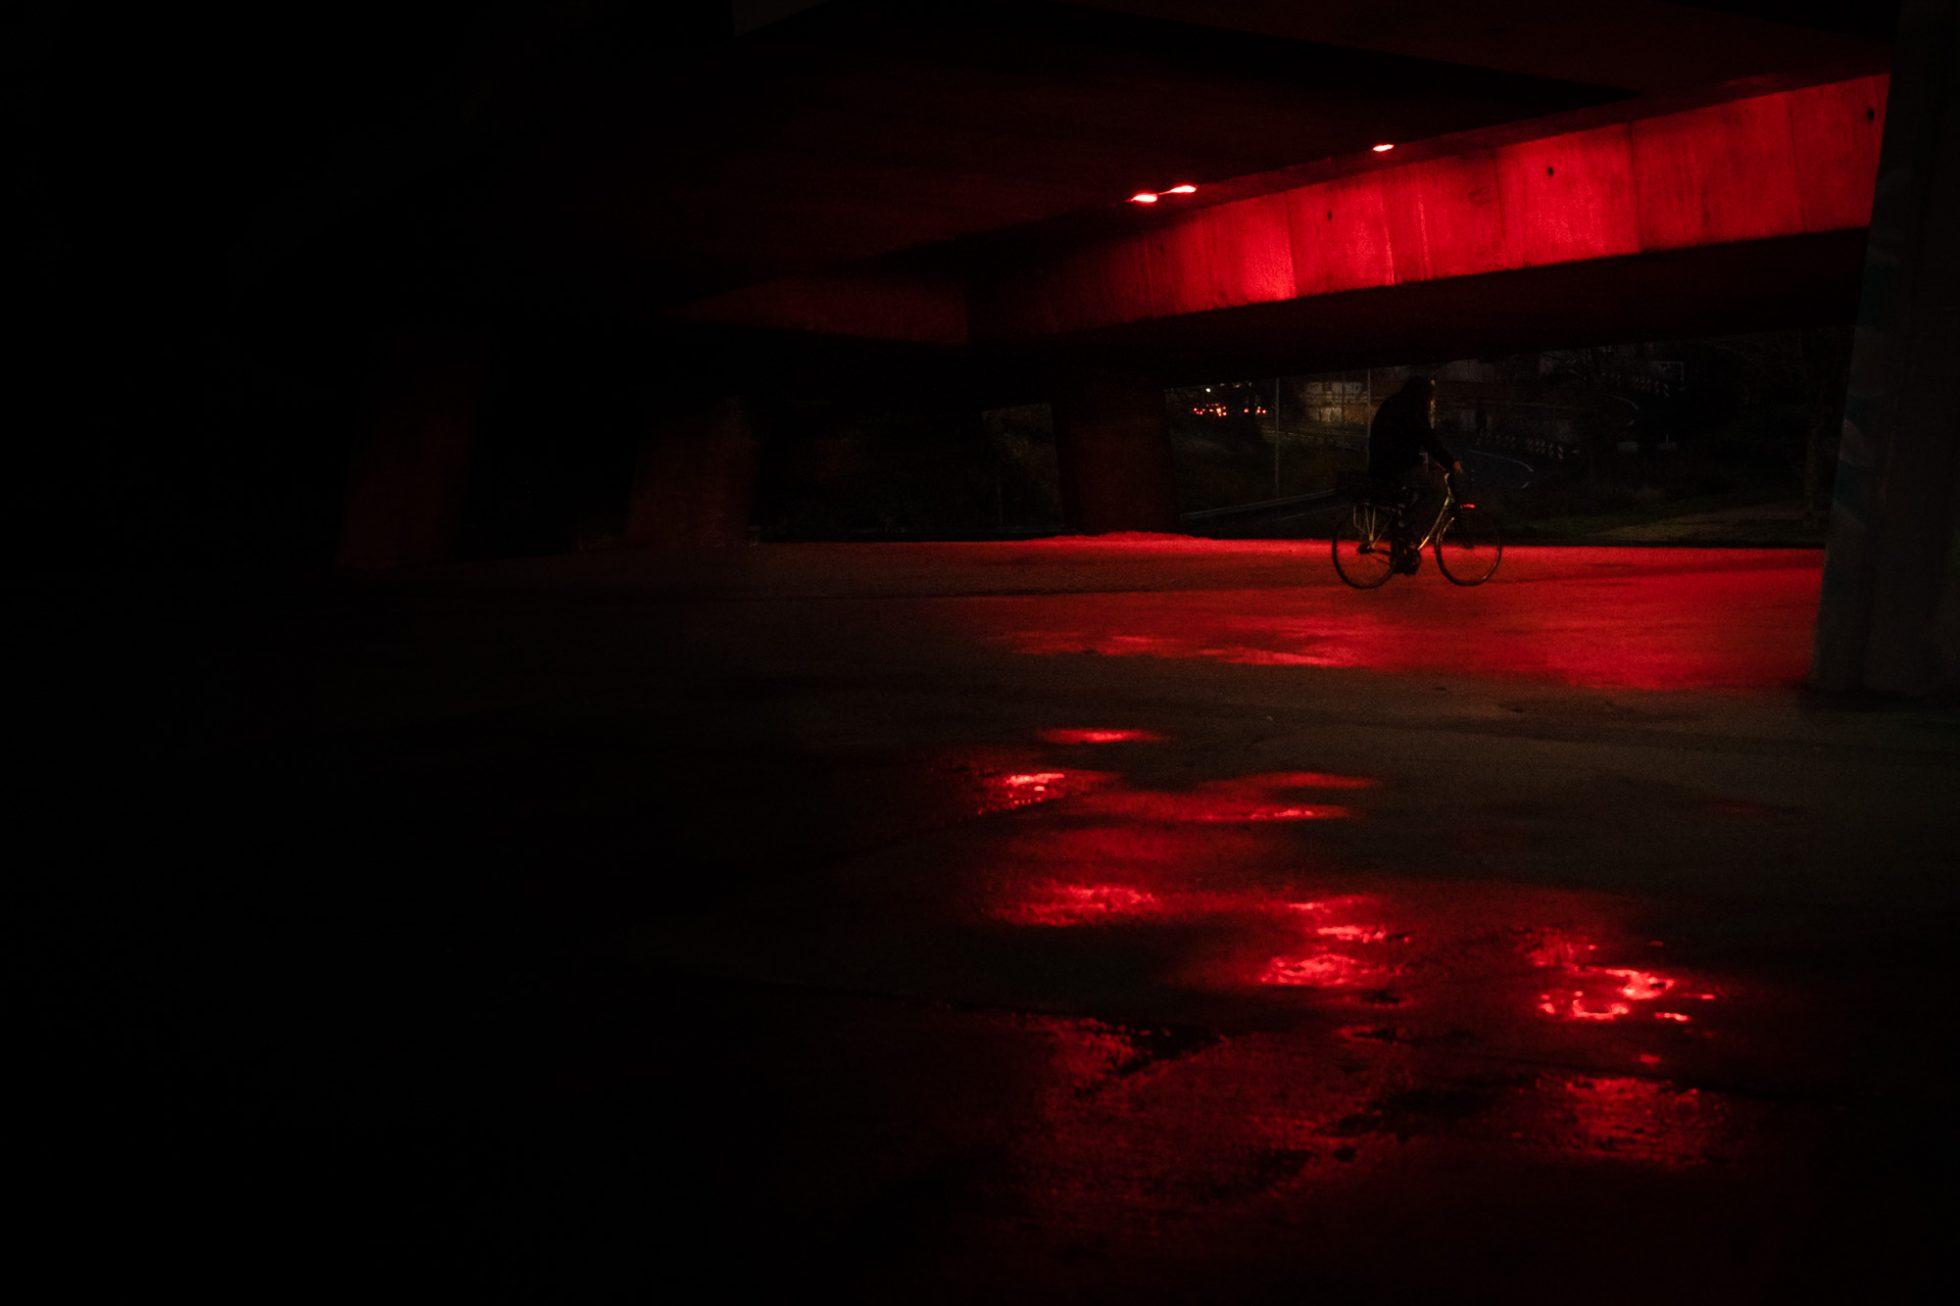 Paris Street Photography - Night and Low light - Merja Varkemaa Photography